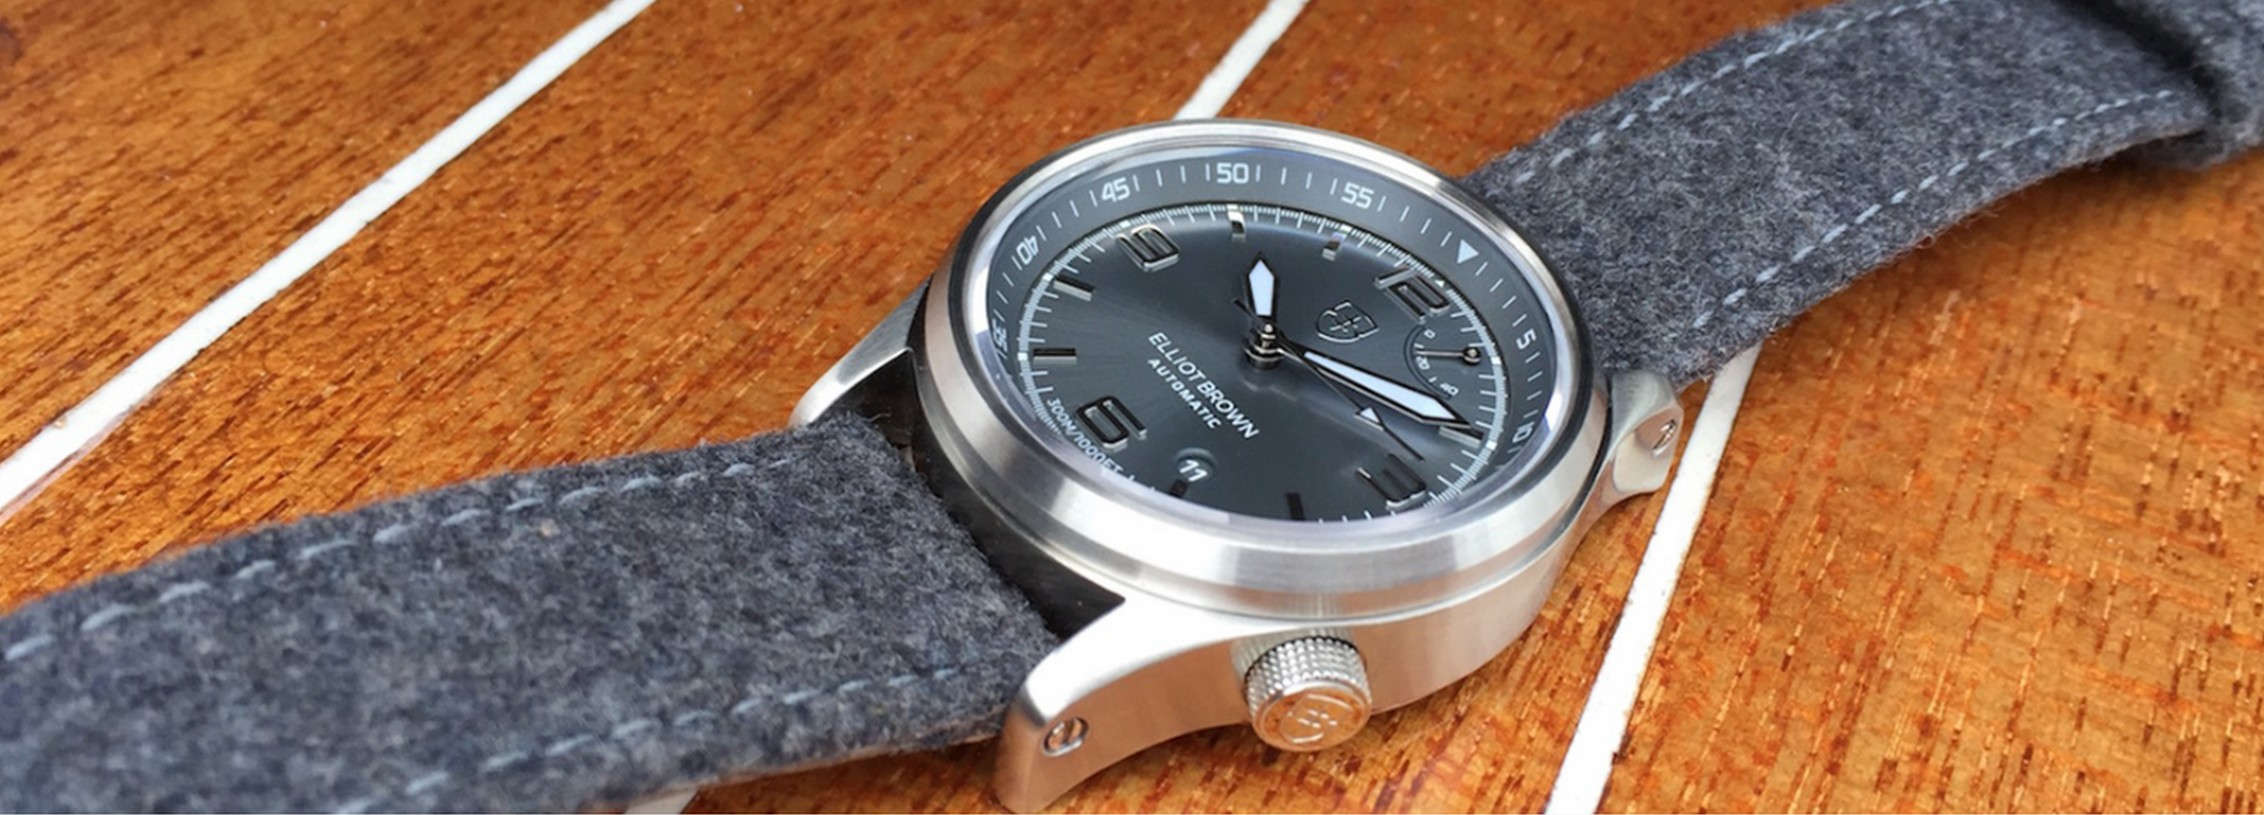 Elliot Brown Presents The Tyneham Watch